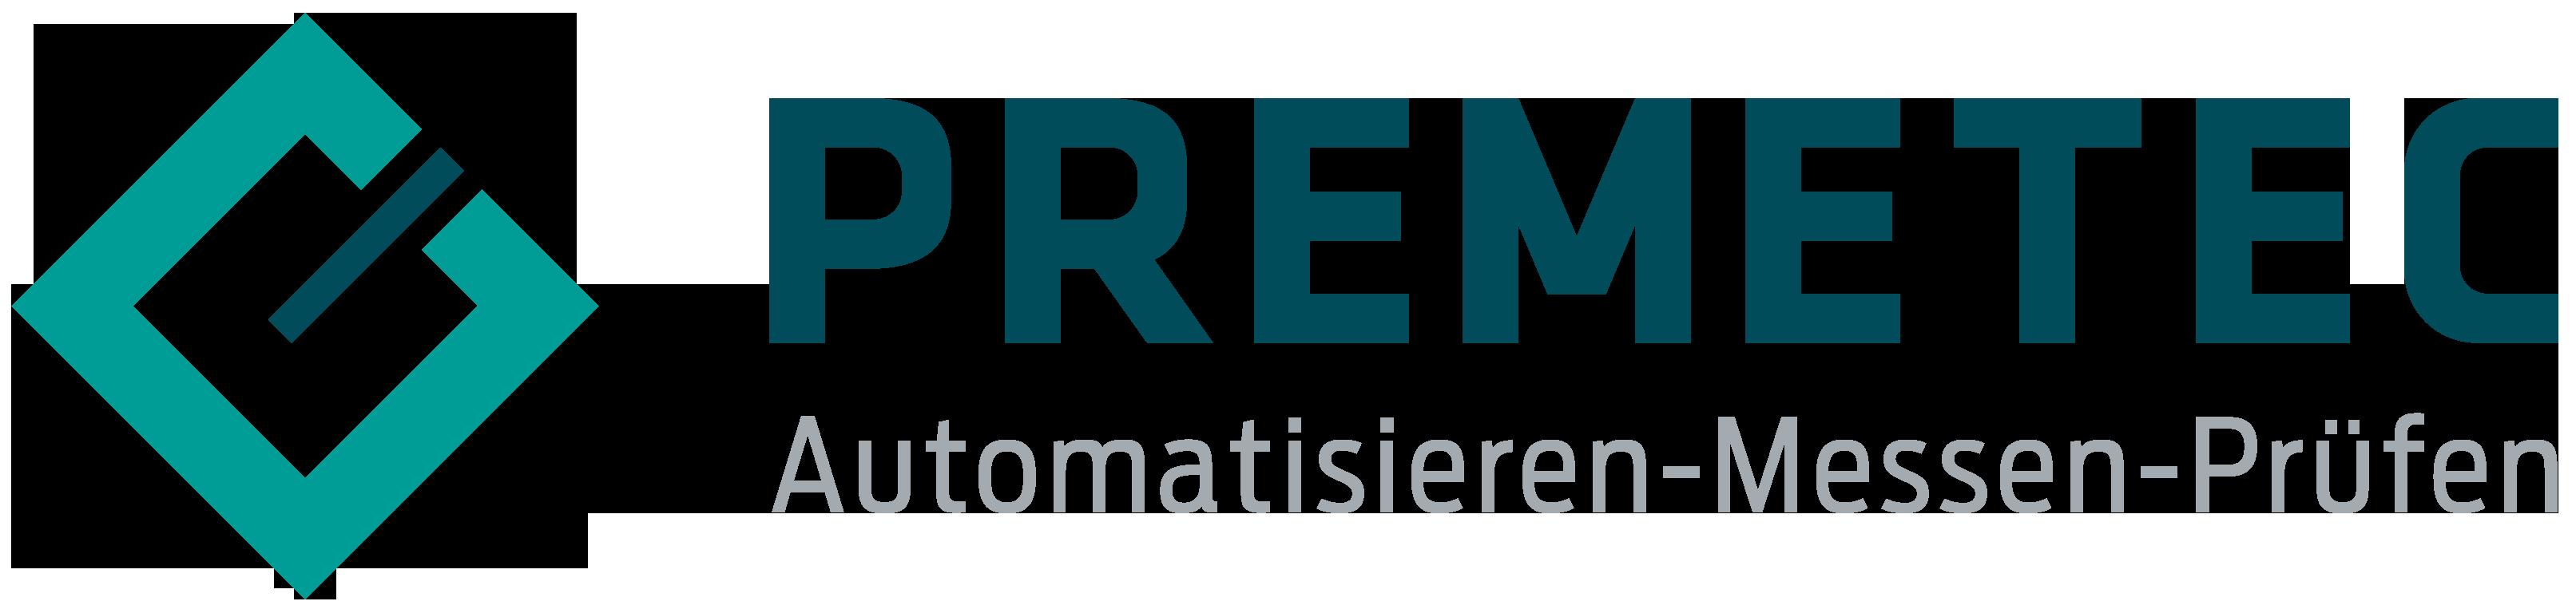 Premetec Automation Logo